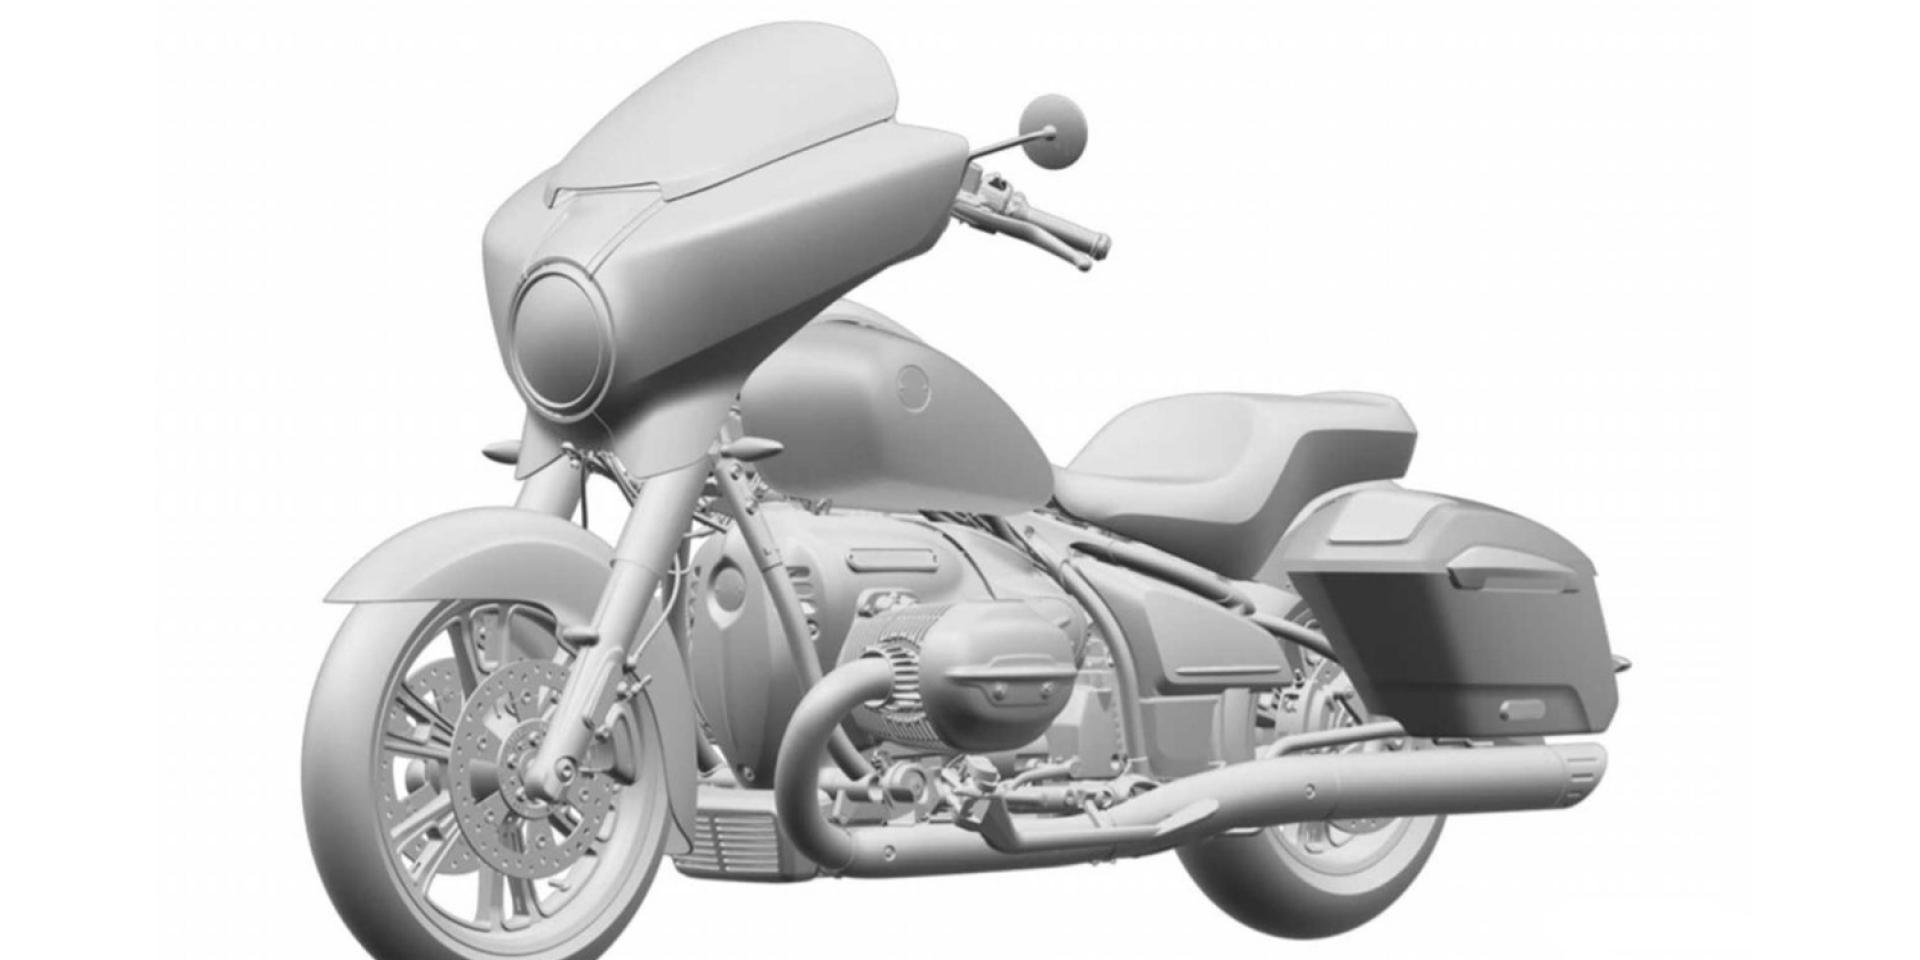 HONDA為Ghost in the Shell攻殼機動隊所打造的未來版NM4   SUPERMOTO8